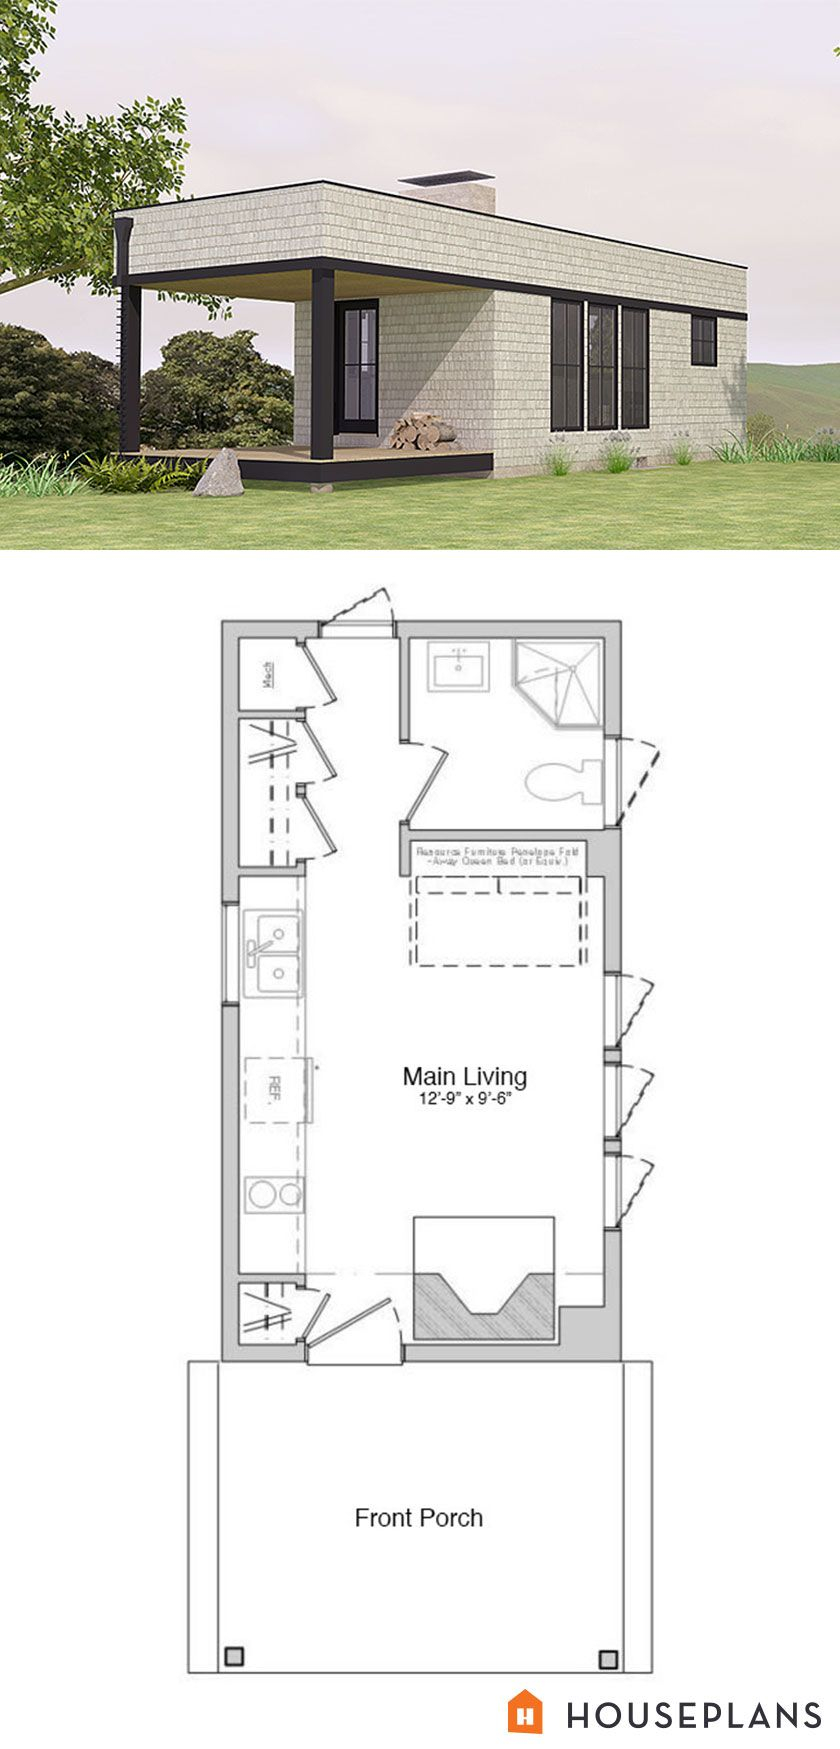 Modern Style House Plan - 4 Beds 4 Baths 344 Sq/Ft Plan #944-4